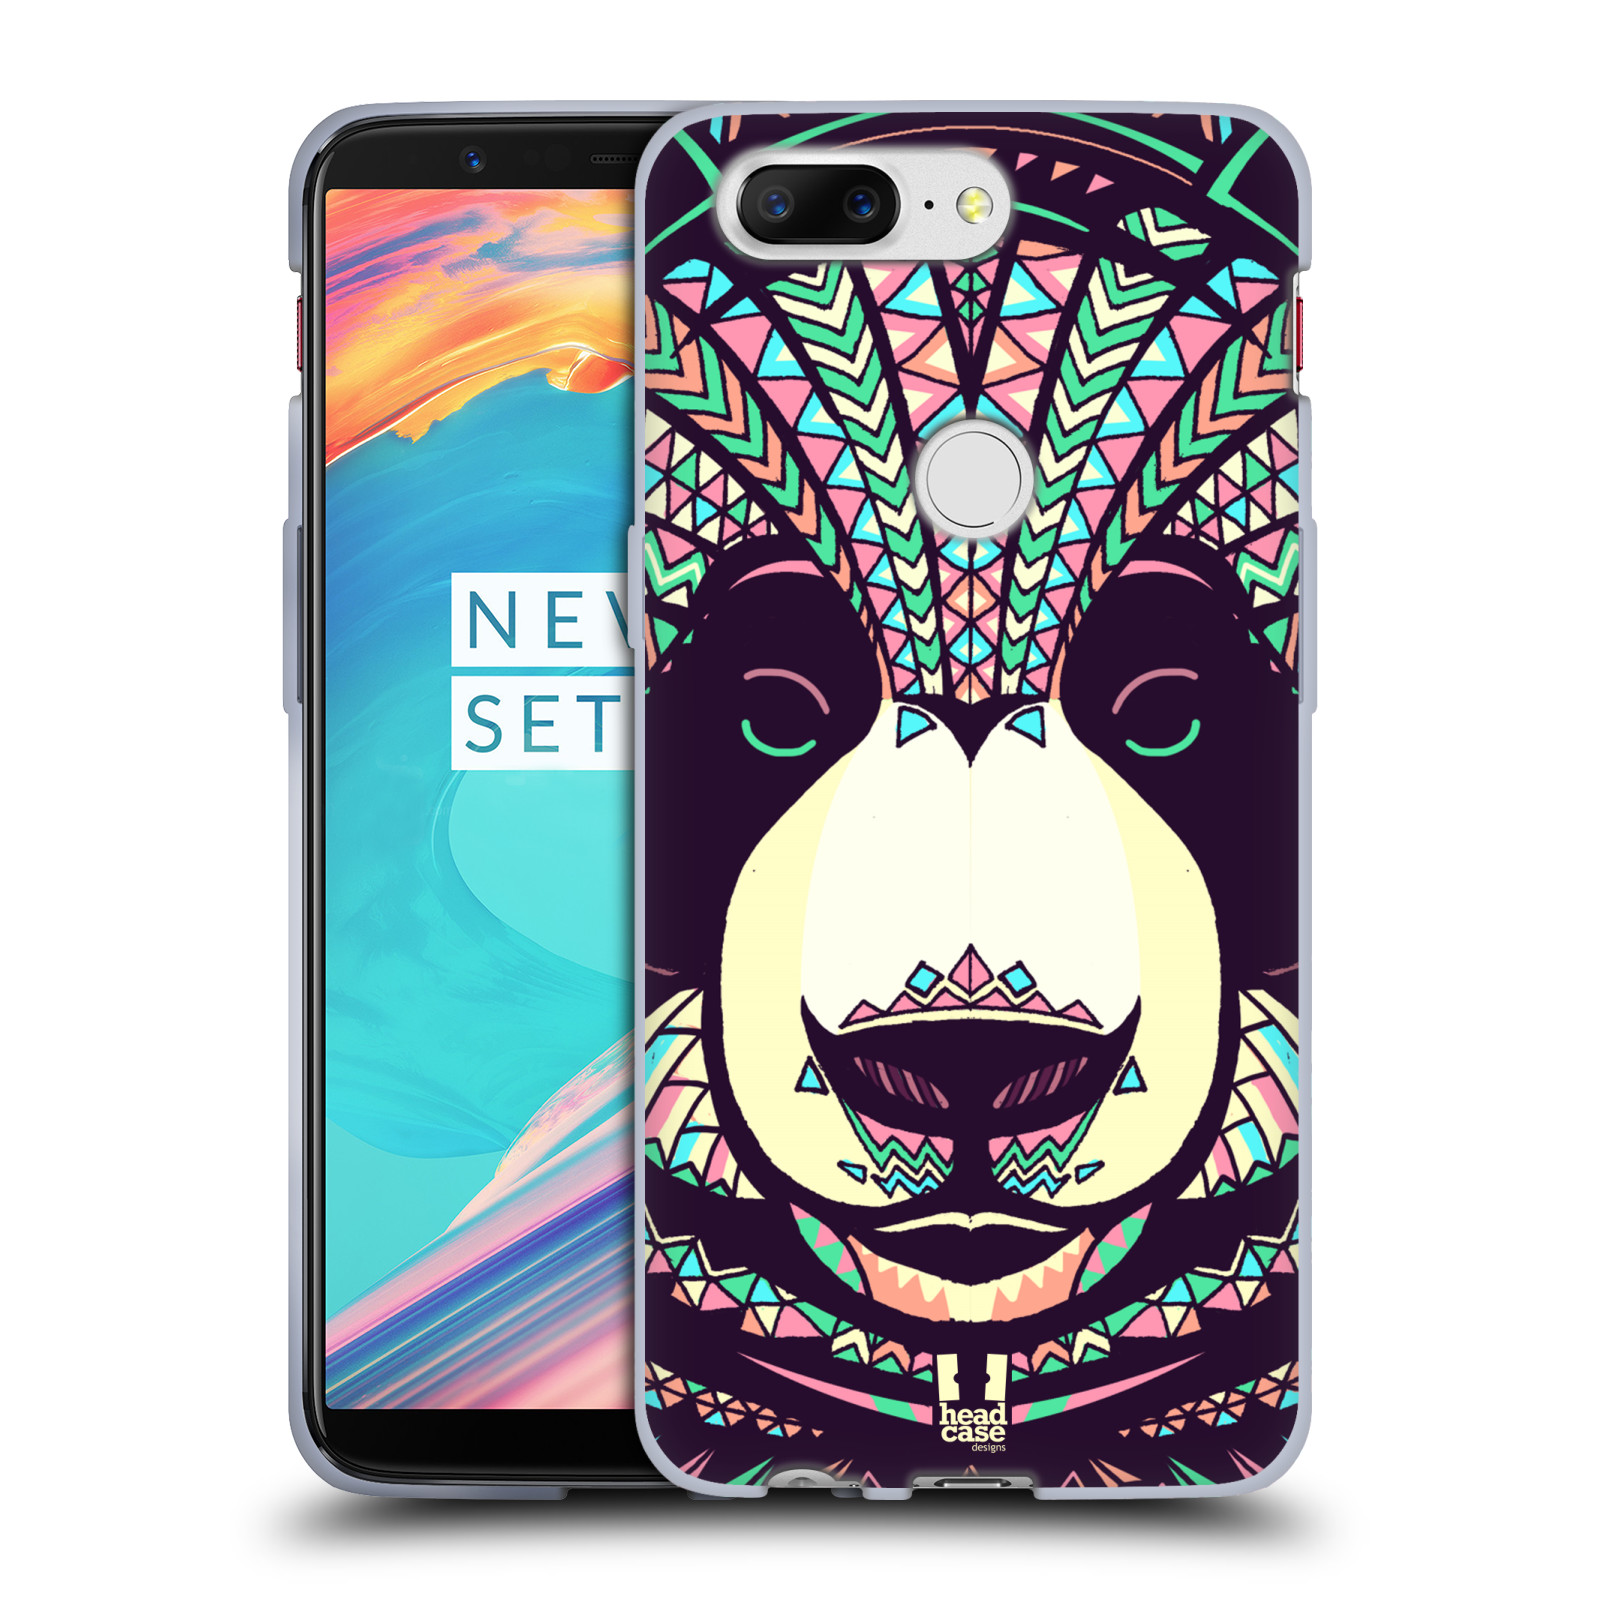 Silikonové pouzdro na mobil OnePlus 5T - Head Case - AZTEC PANDA